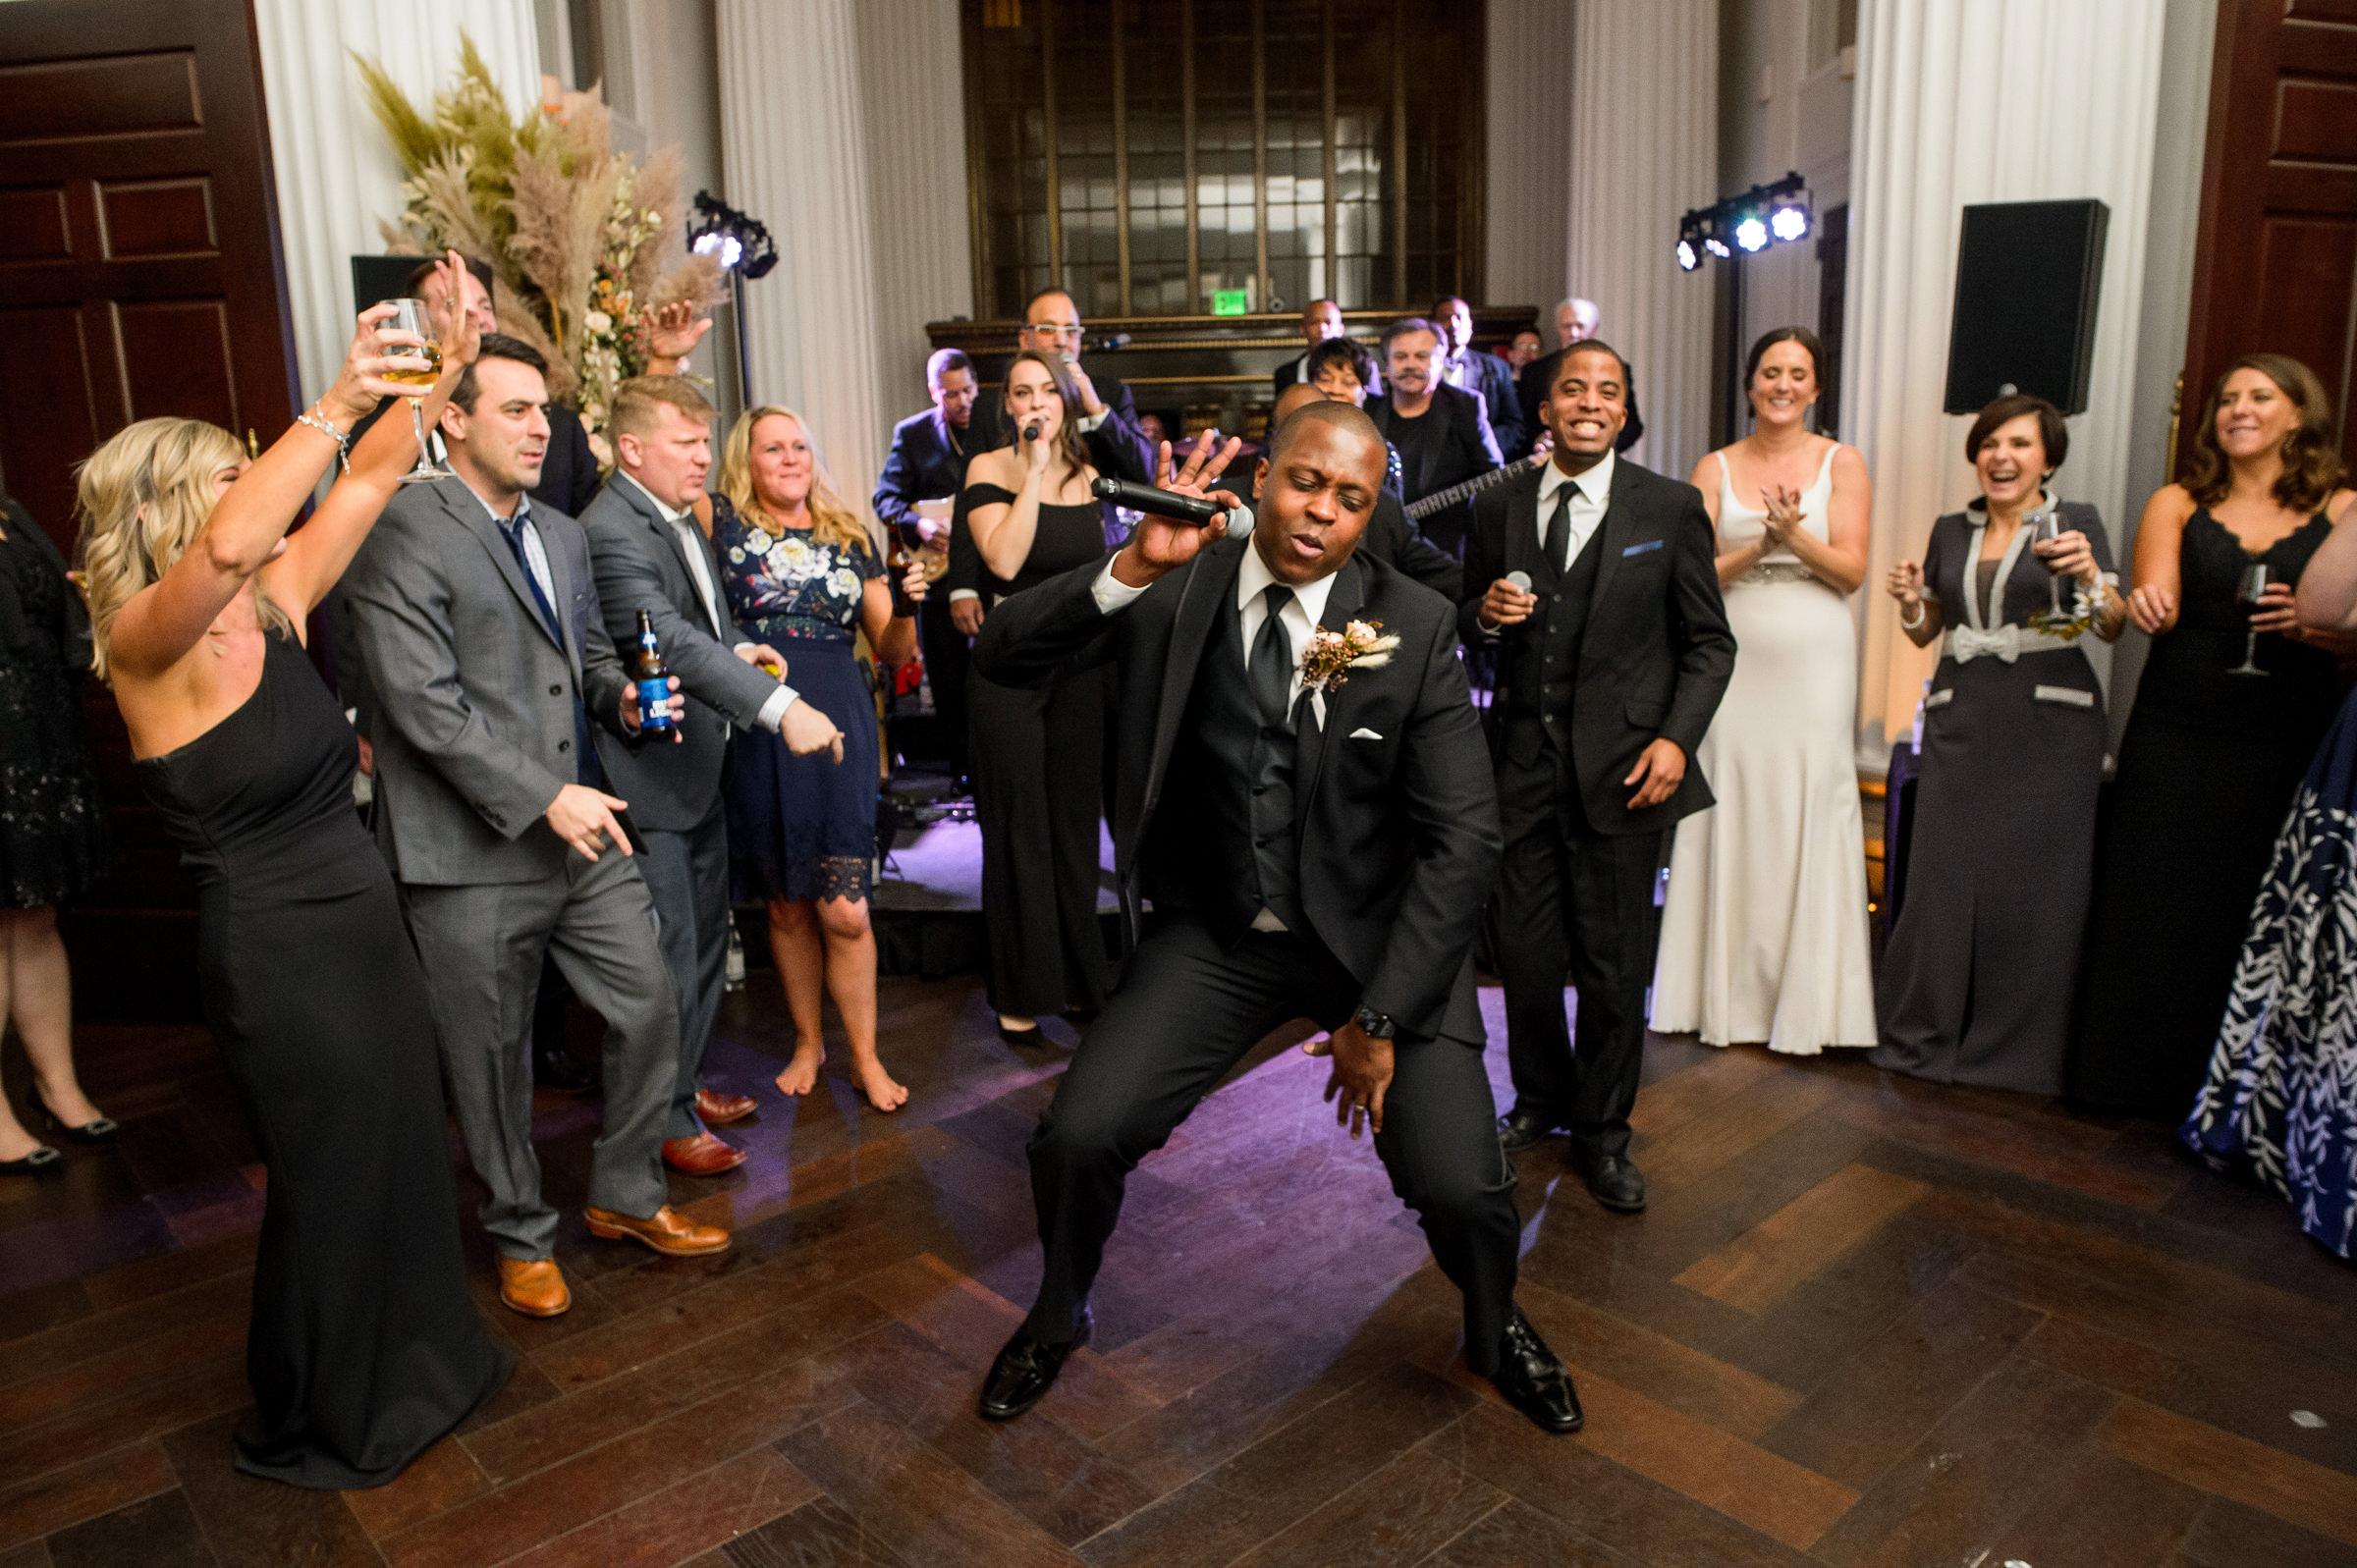 groom-singing-and-dancing-joe-appel-photography-pa